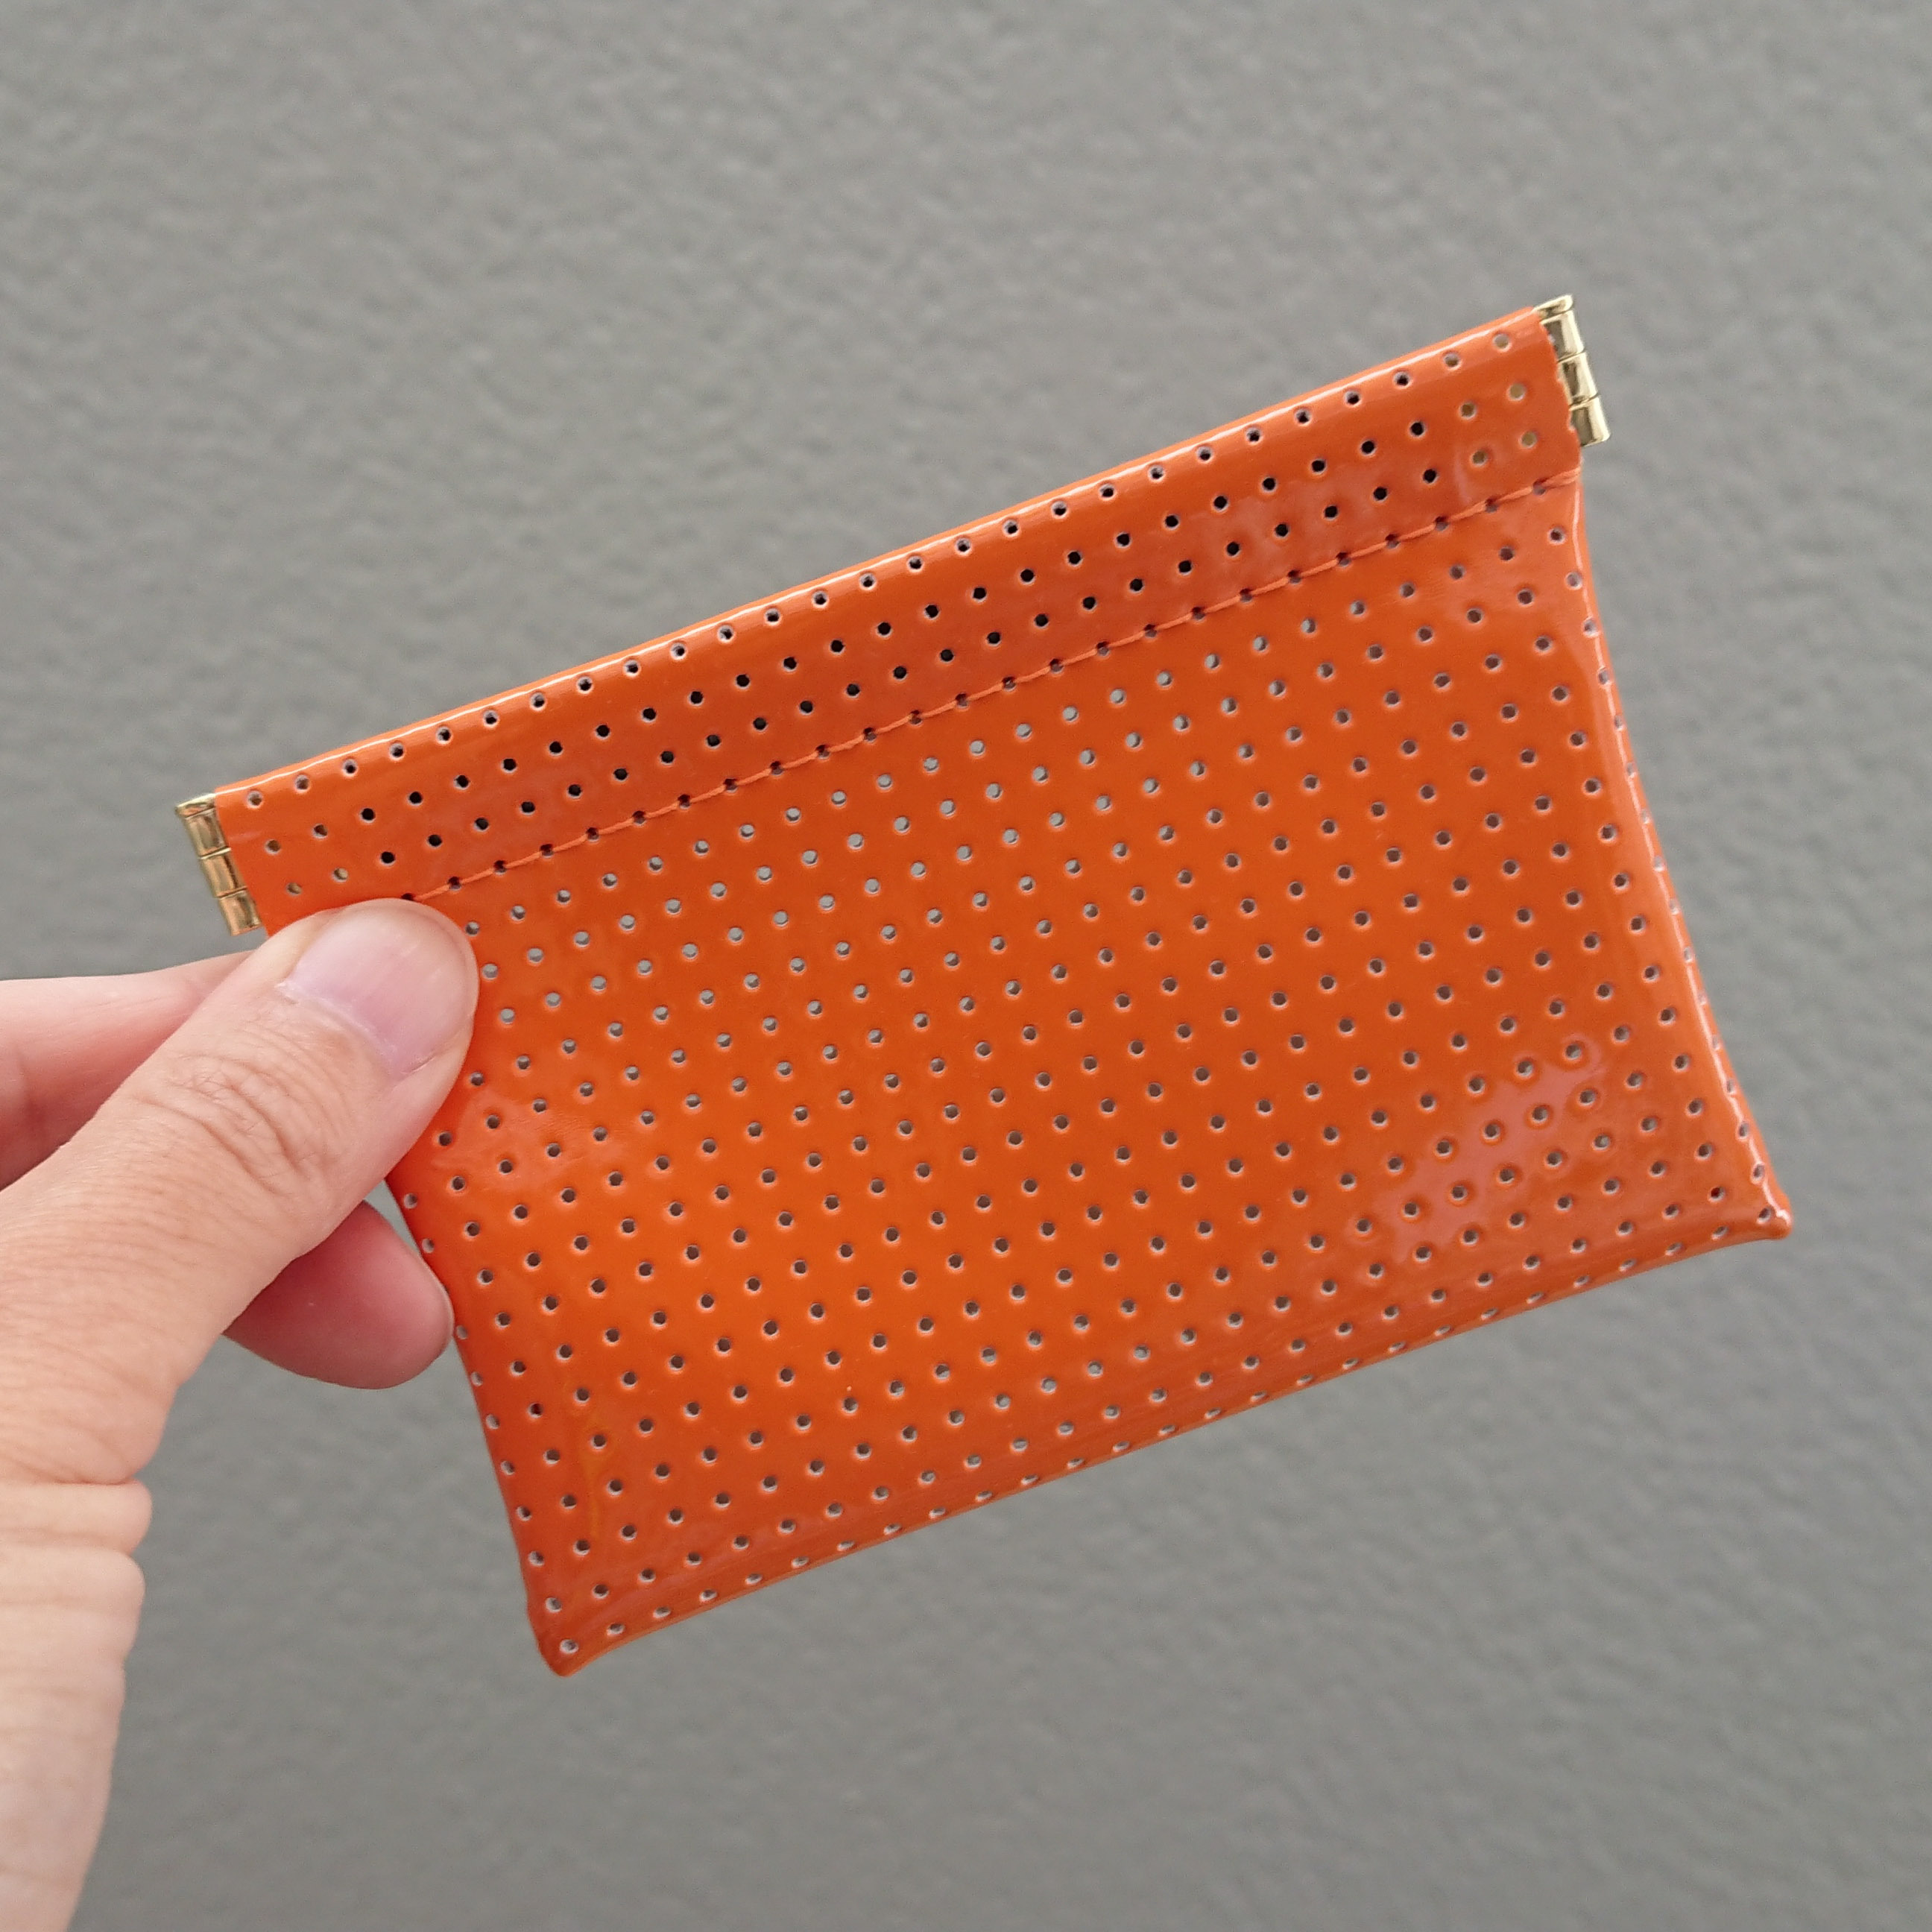 OSORO カードケース ☆ みかん コインケース 財布 ポーチ イヤホンケース ピルケース